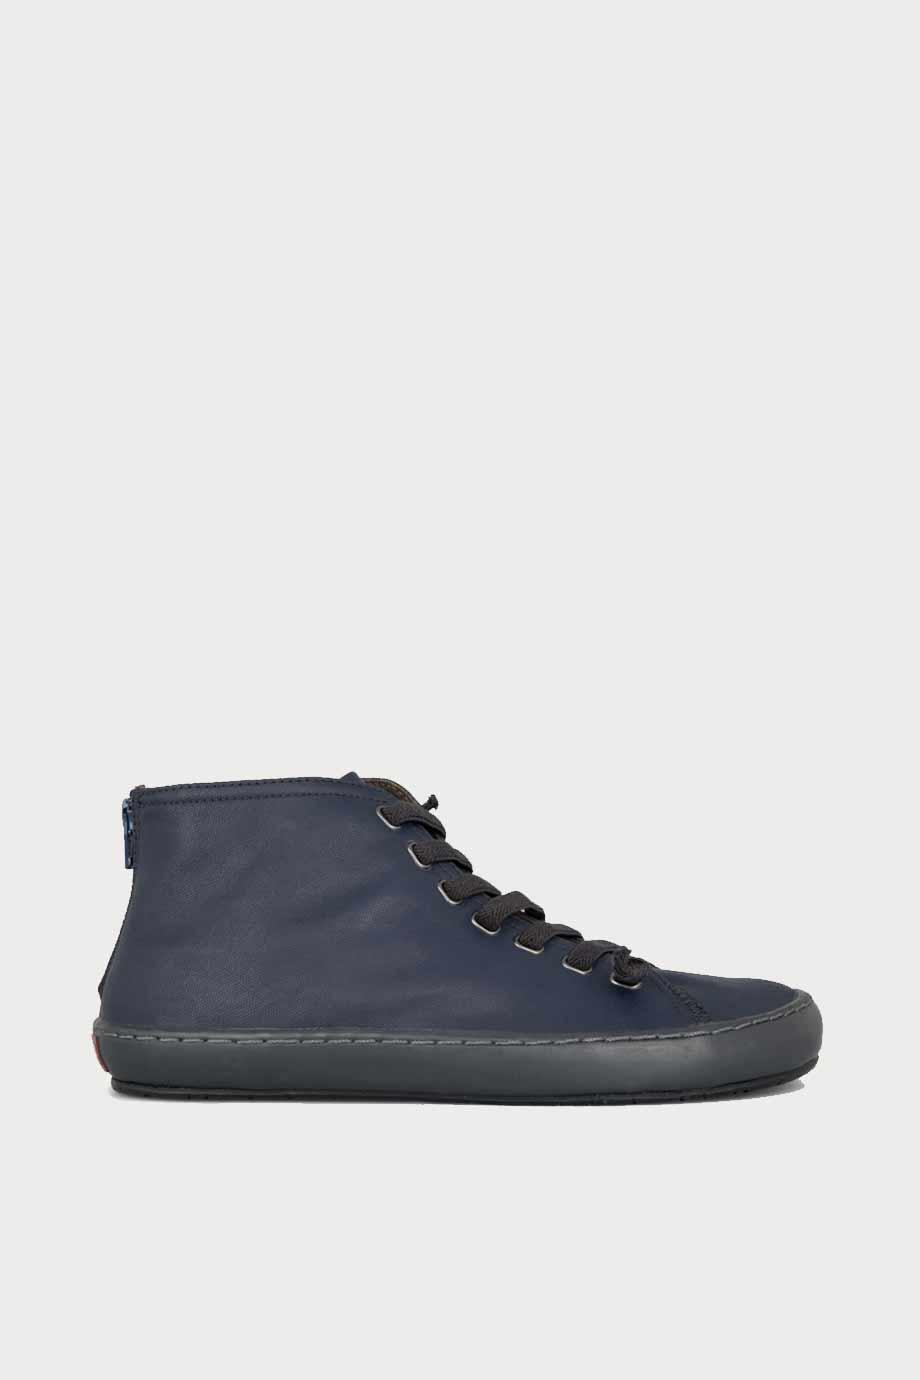 spiridoula metheniti shoes xalkida p Camper 36592 007 Peu Rumbo 3